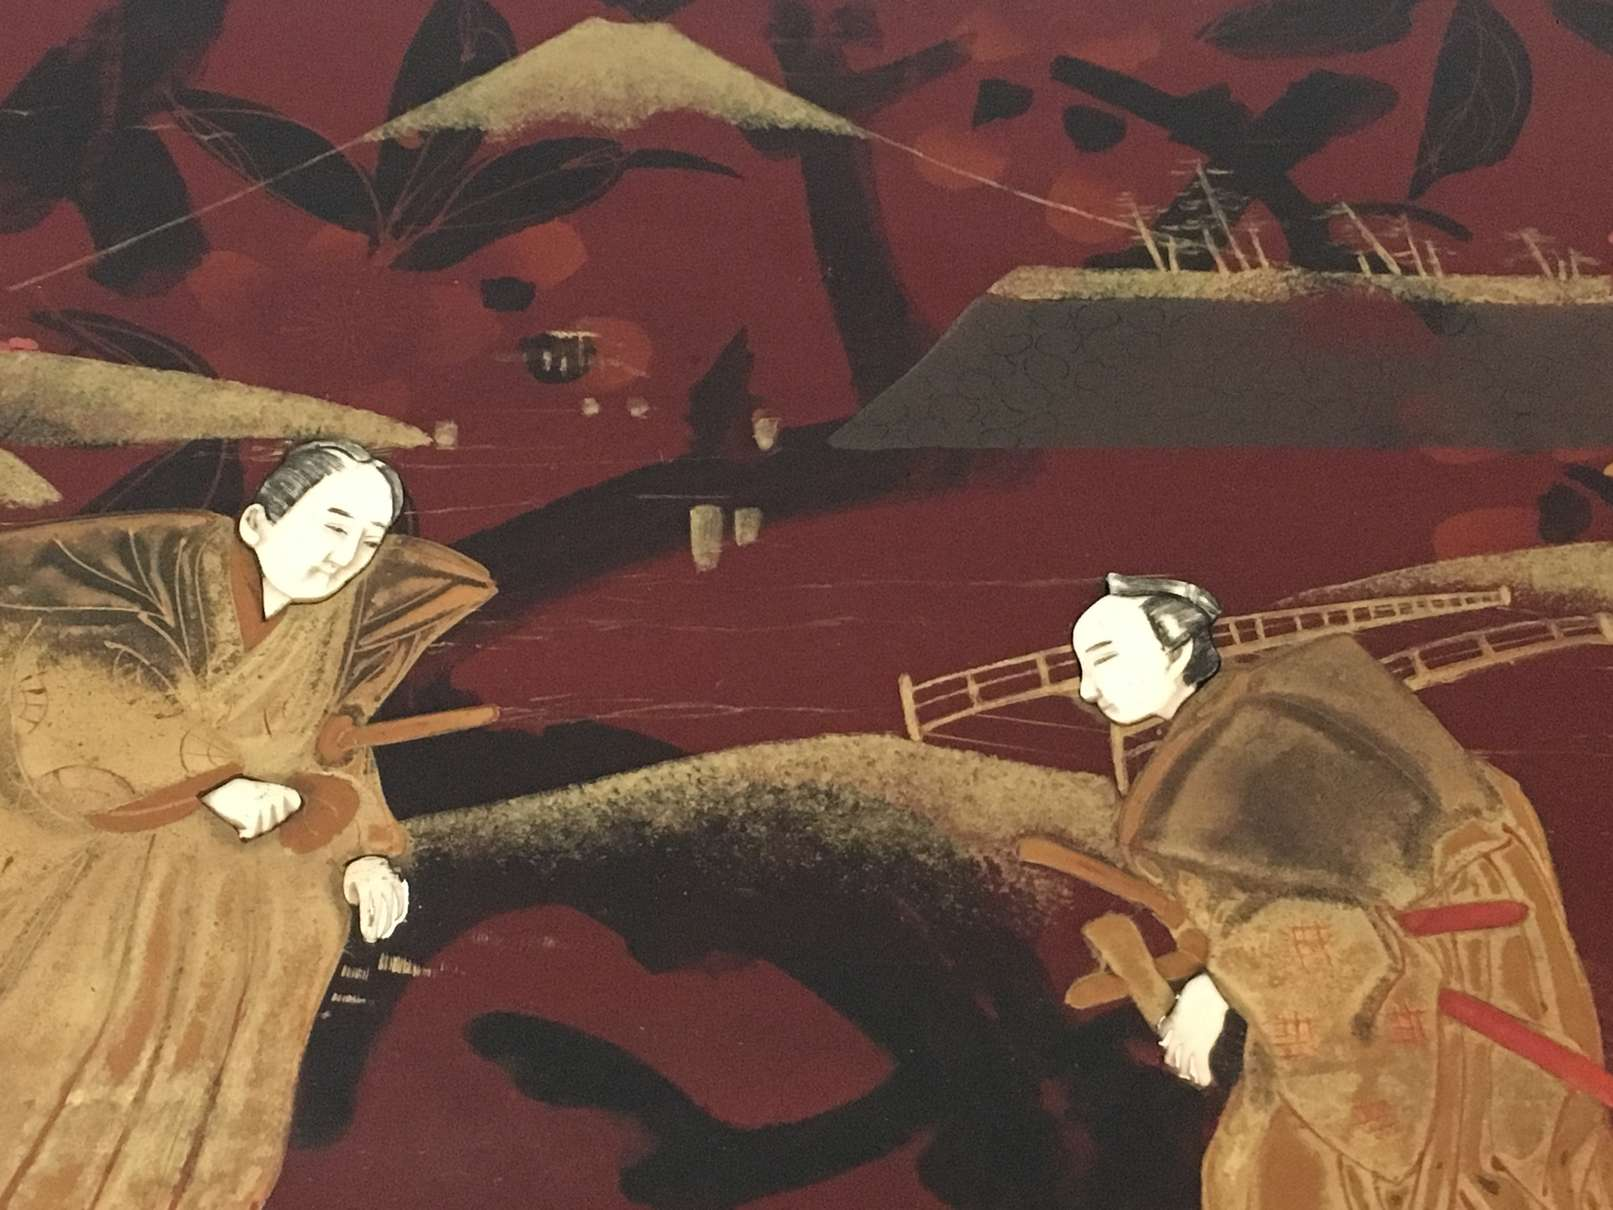 laque-ivoire-album-illustration-hokg-kong-baie-art-restauration-restaurarte.jpg